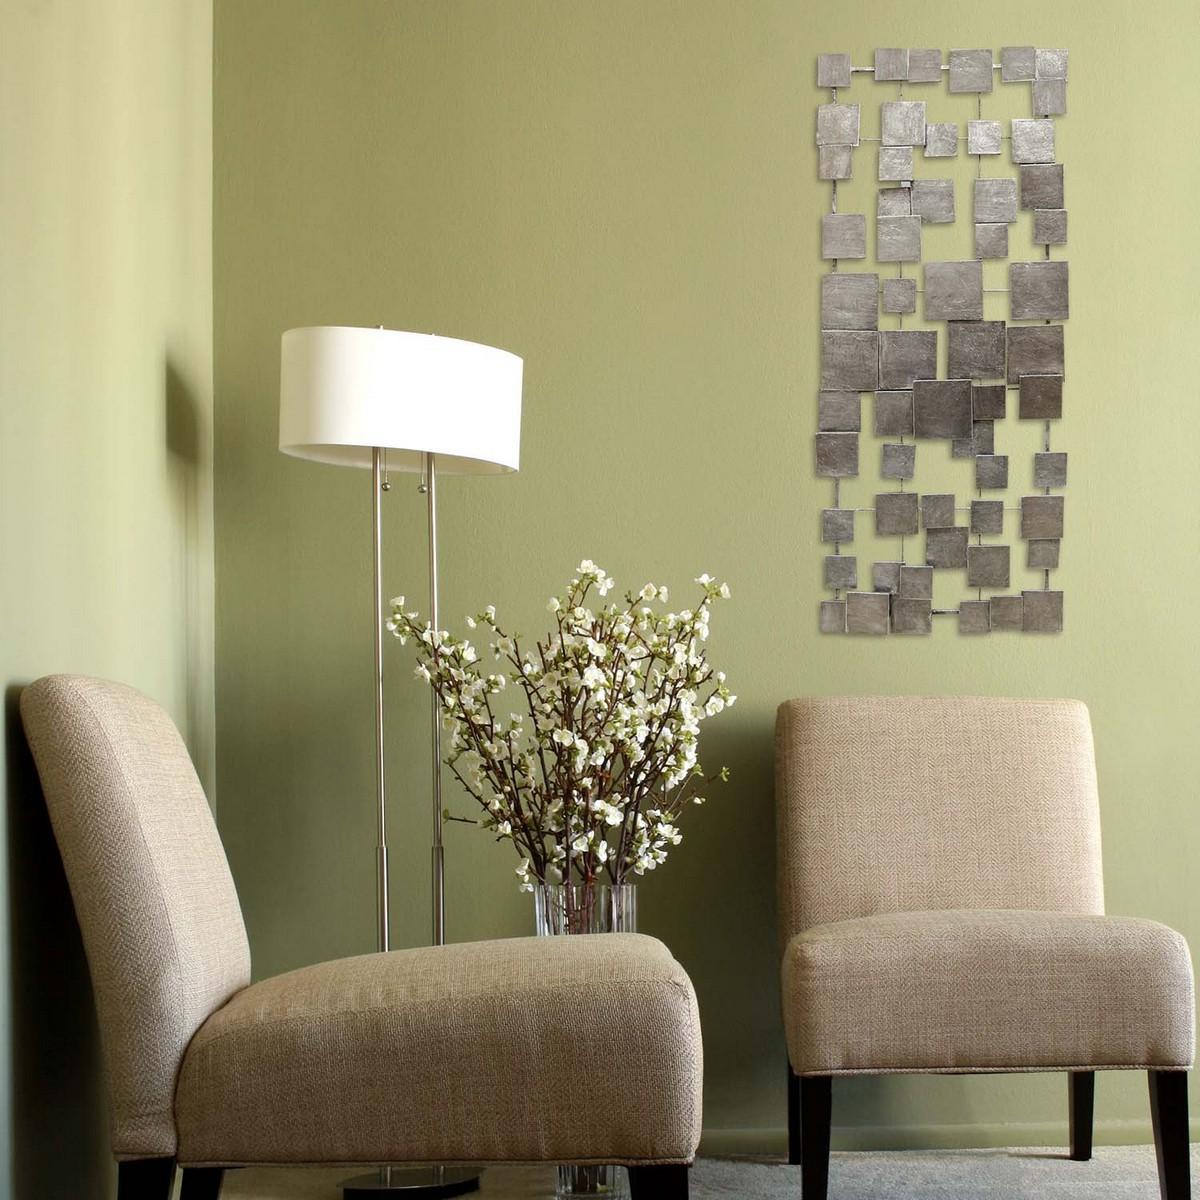 Stratton Home Decor Geometric Tiles Wall Decor - Champagne